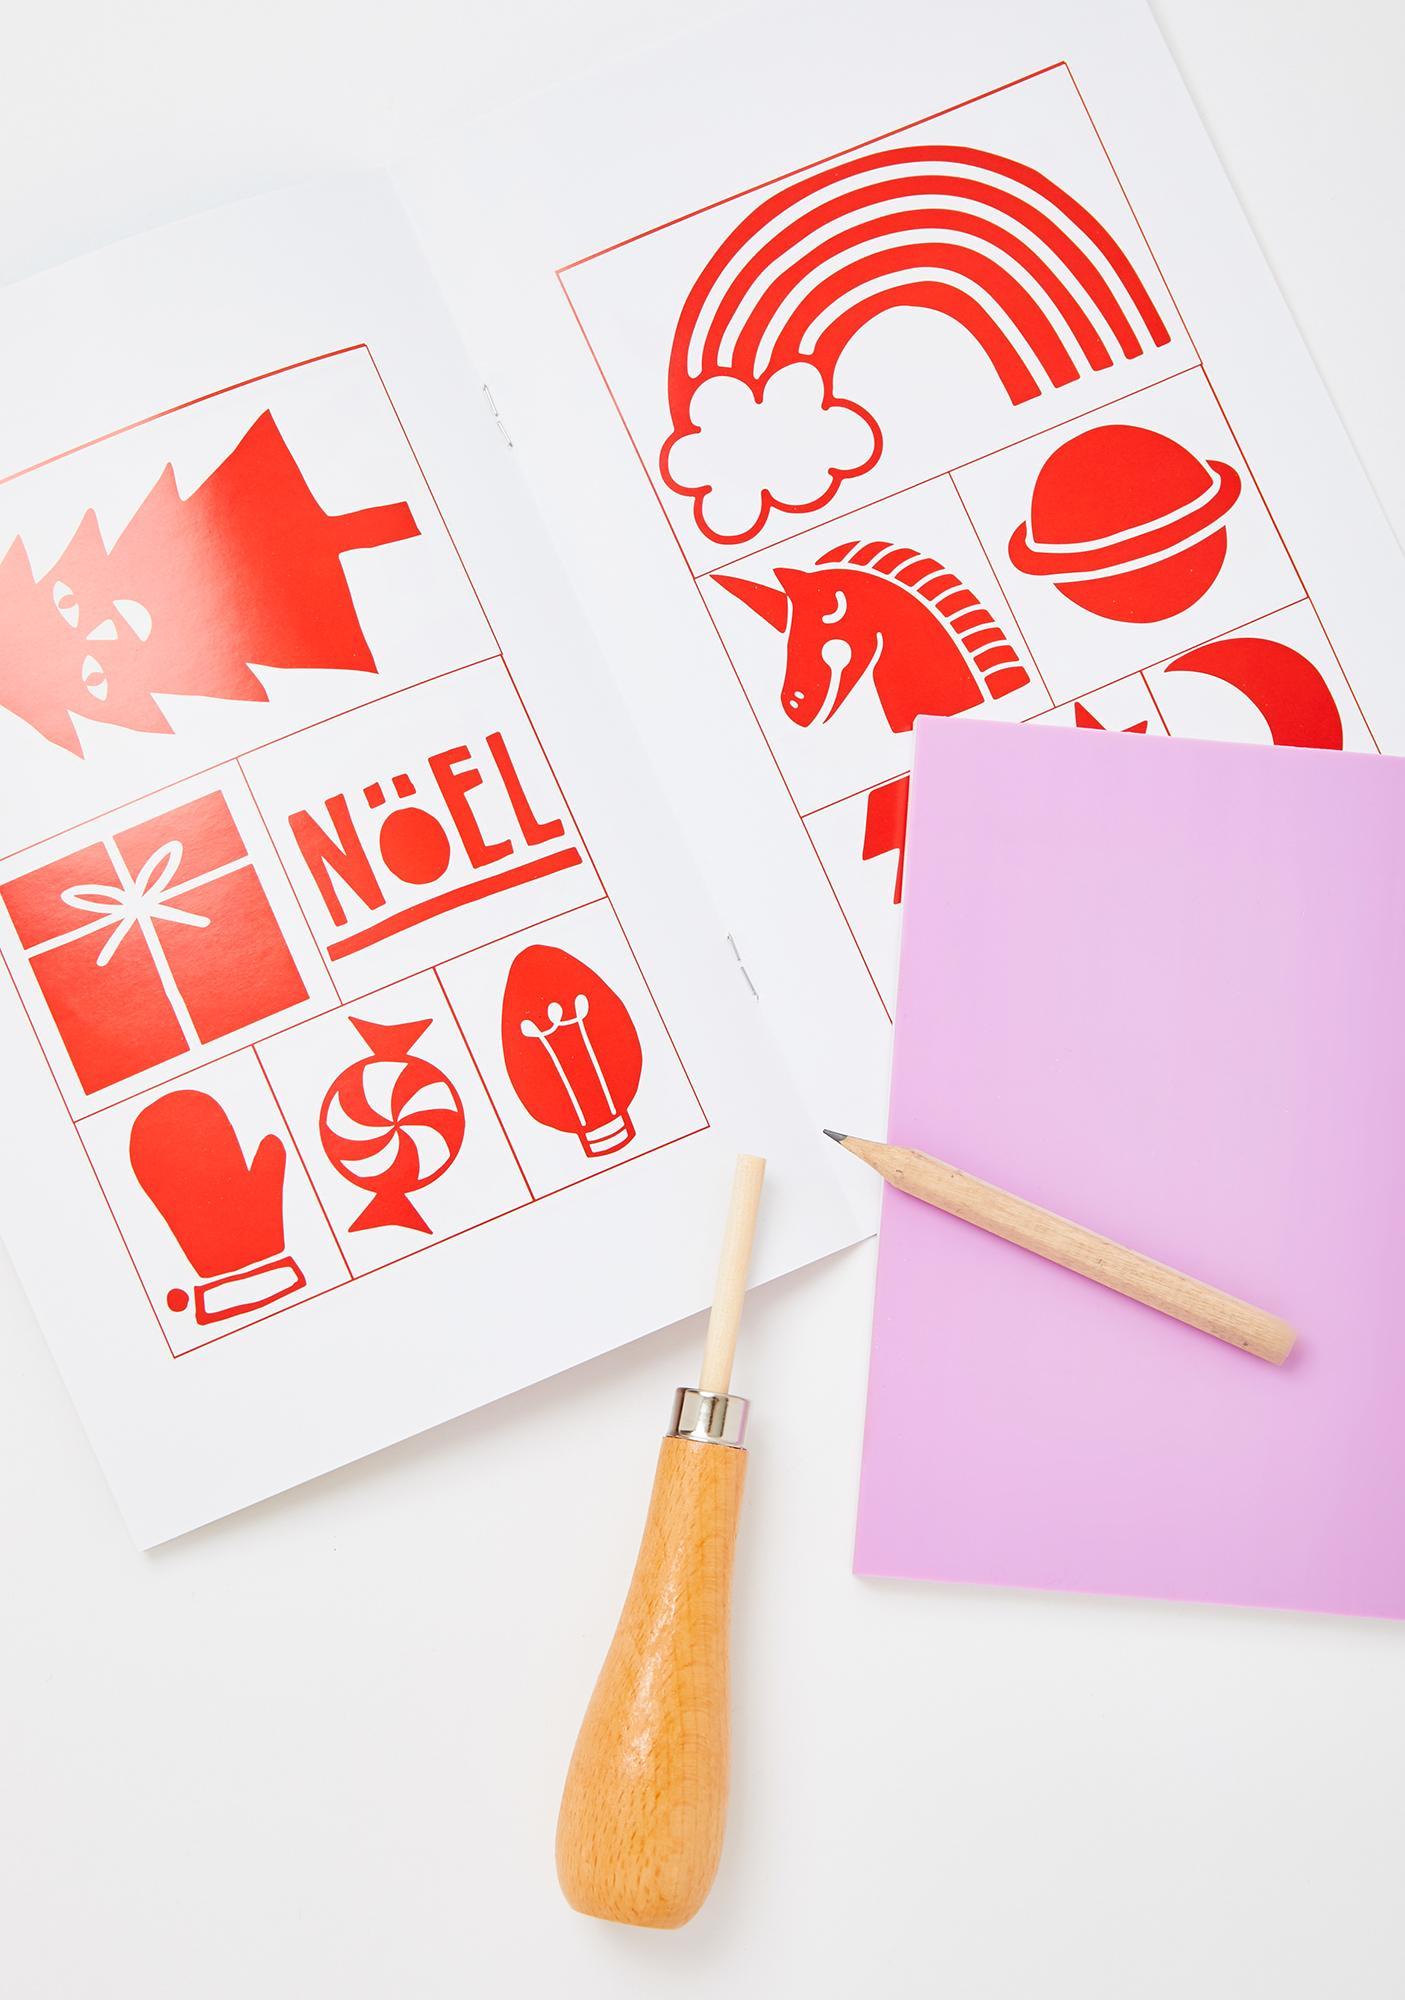 Yellow Owl Workshop Carve-A-Stamp DIY Rubber Stamp Kit